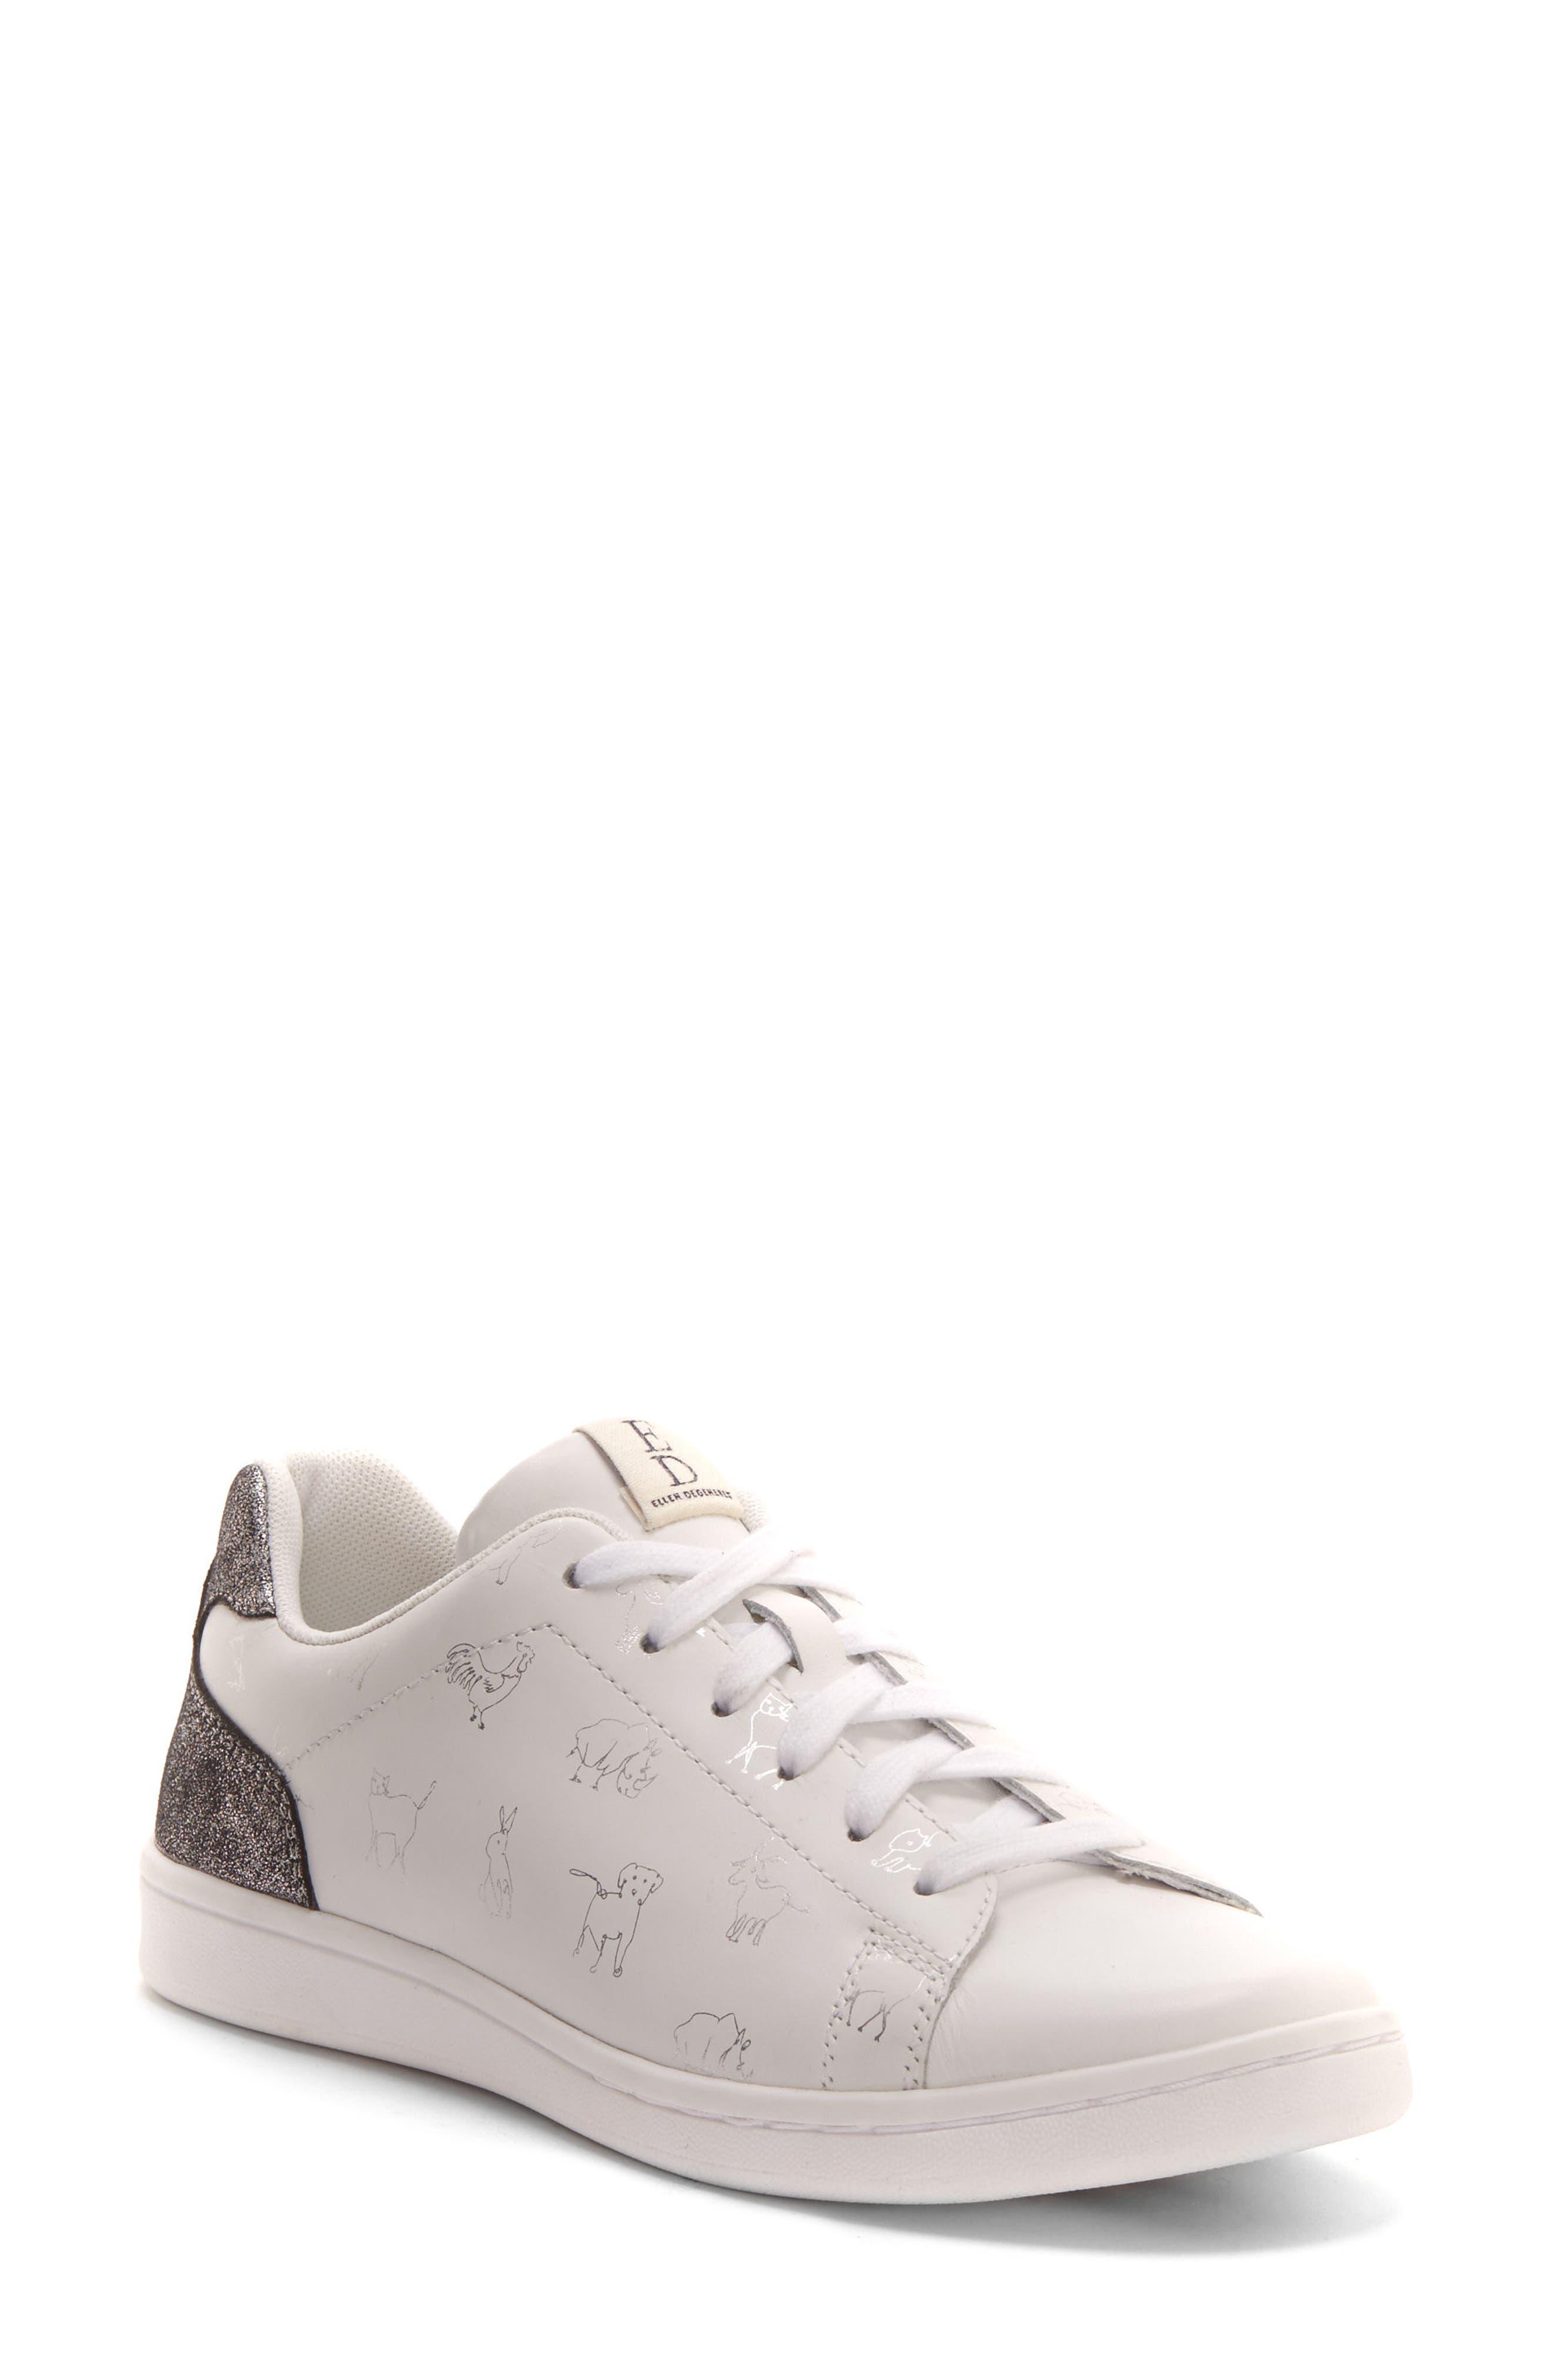 Main Image - ED Ellen DeGeneres Chaboss Sneaker (Women)